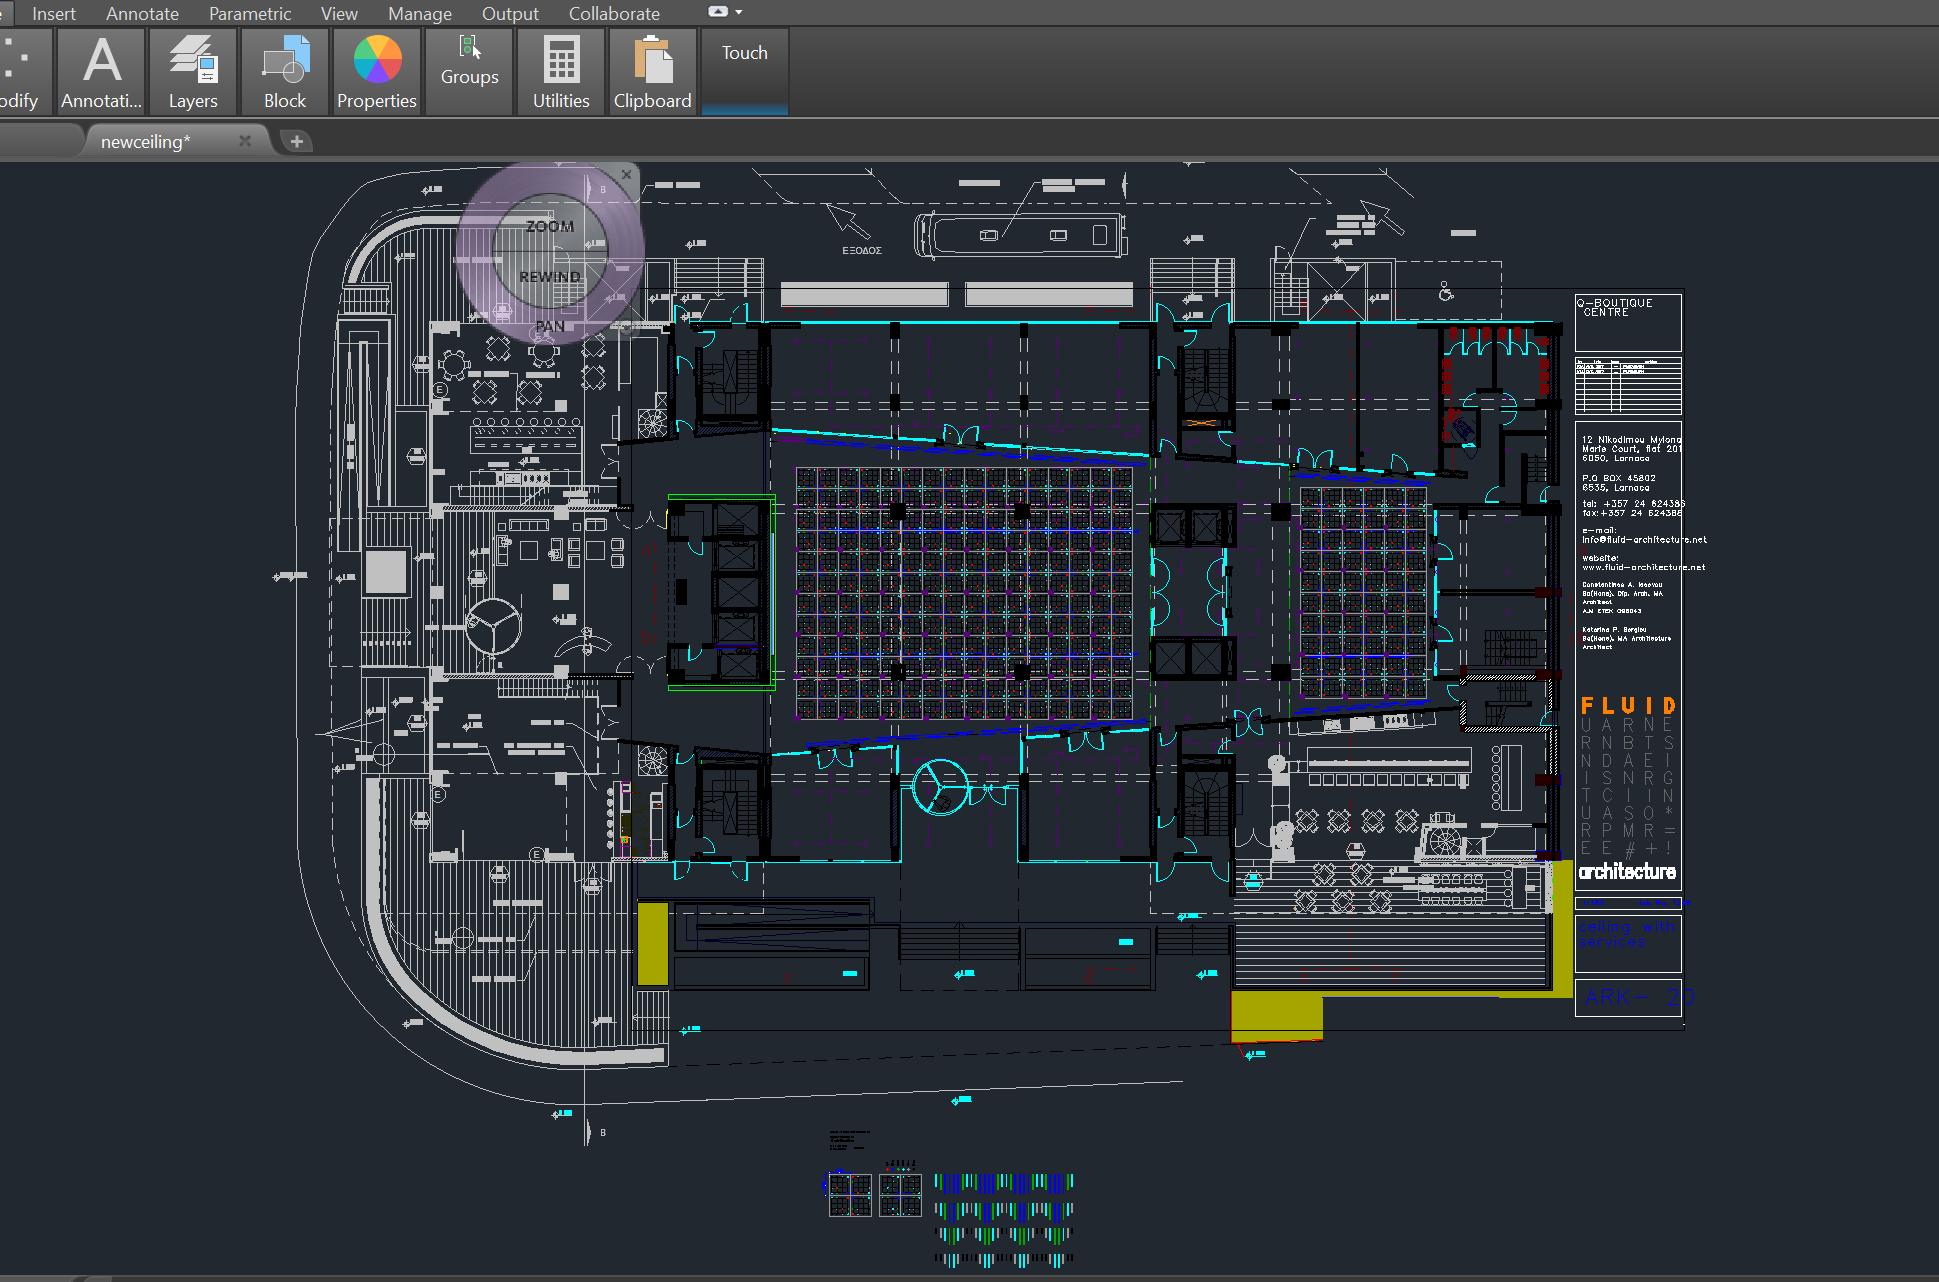 Radisson Blu C_72 (Ceiling layout)